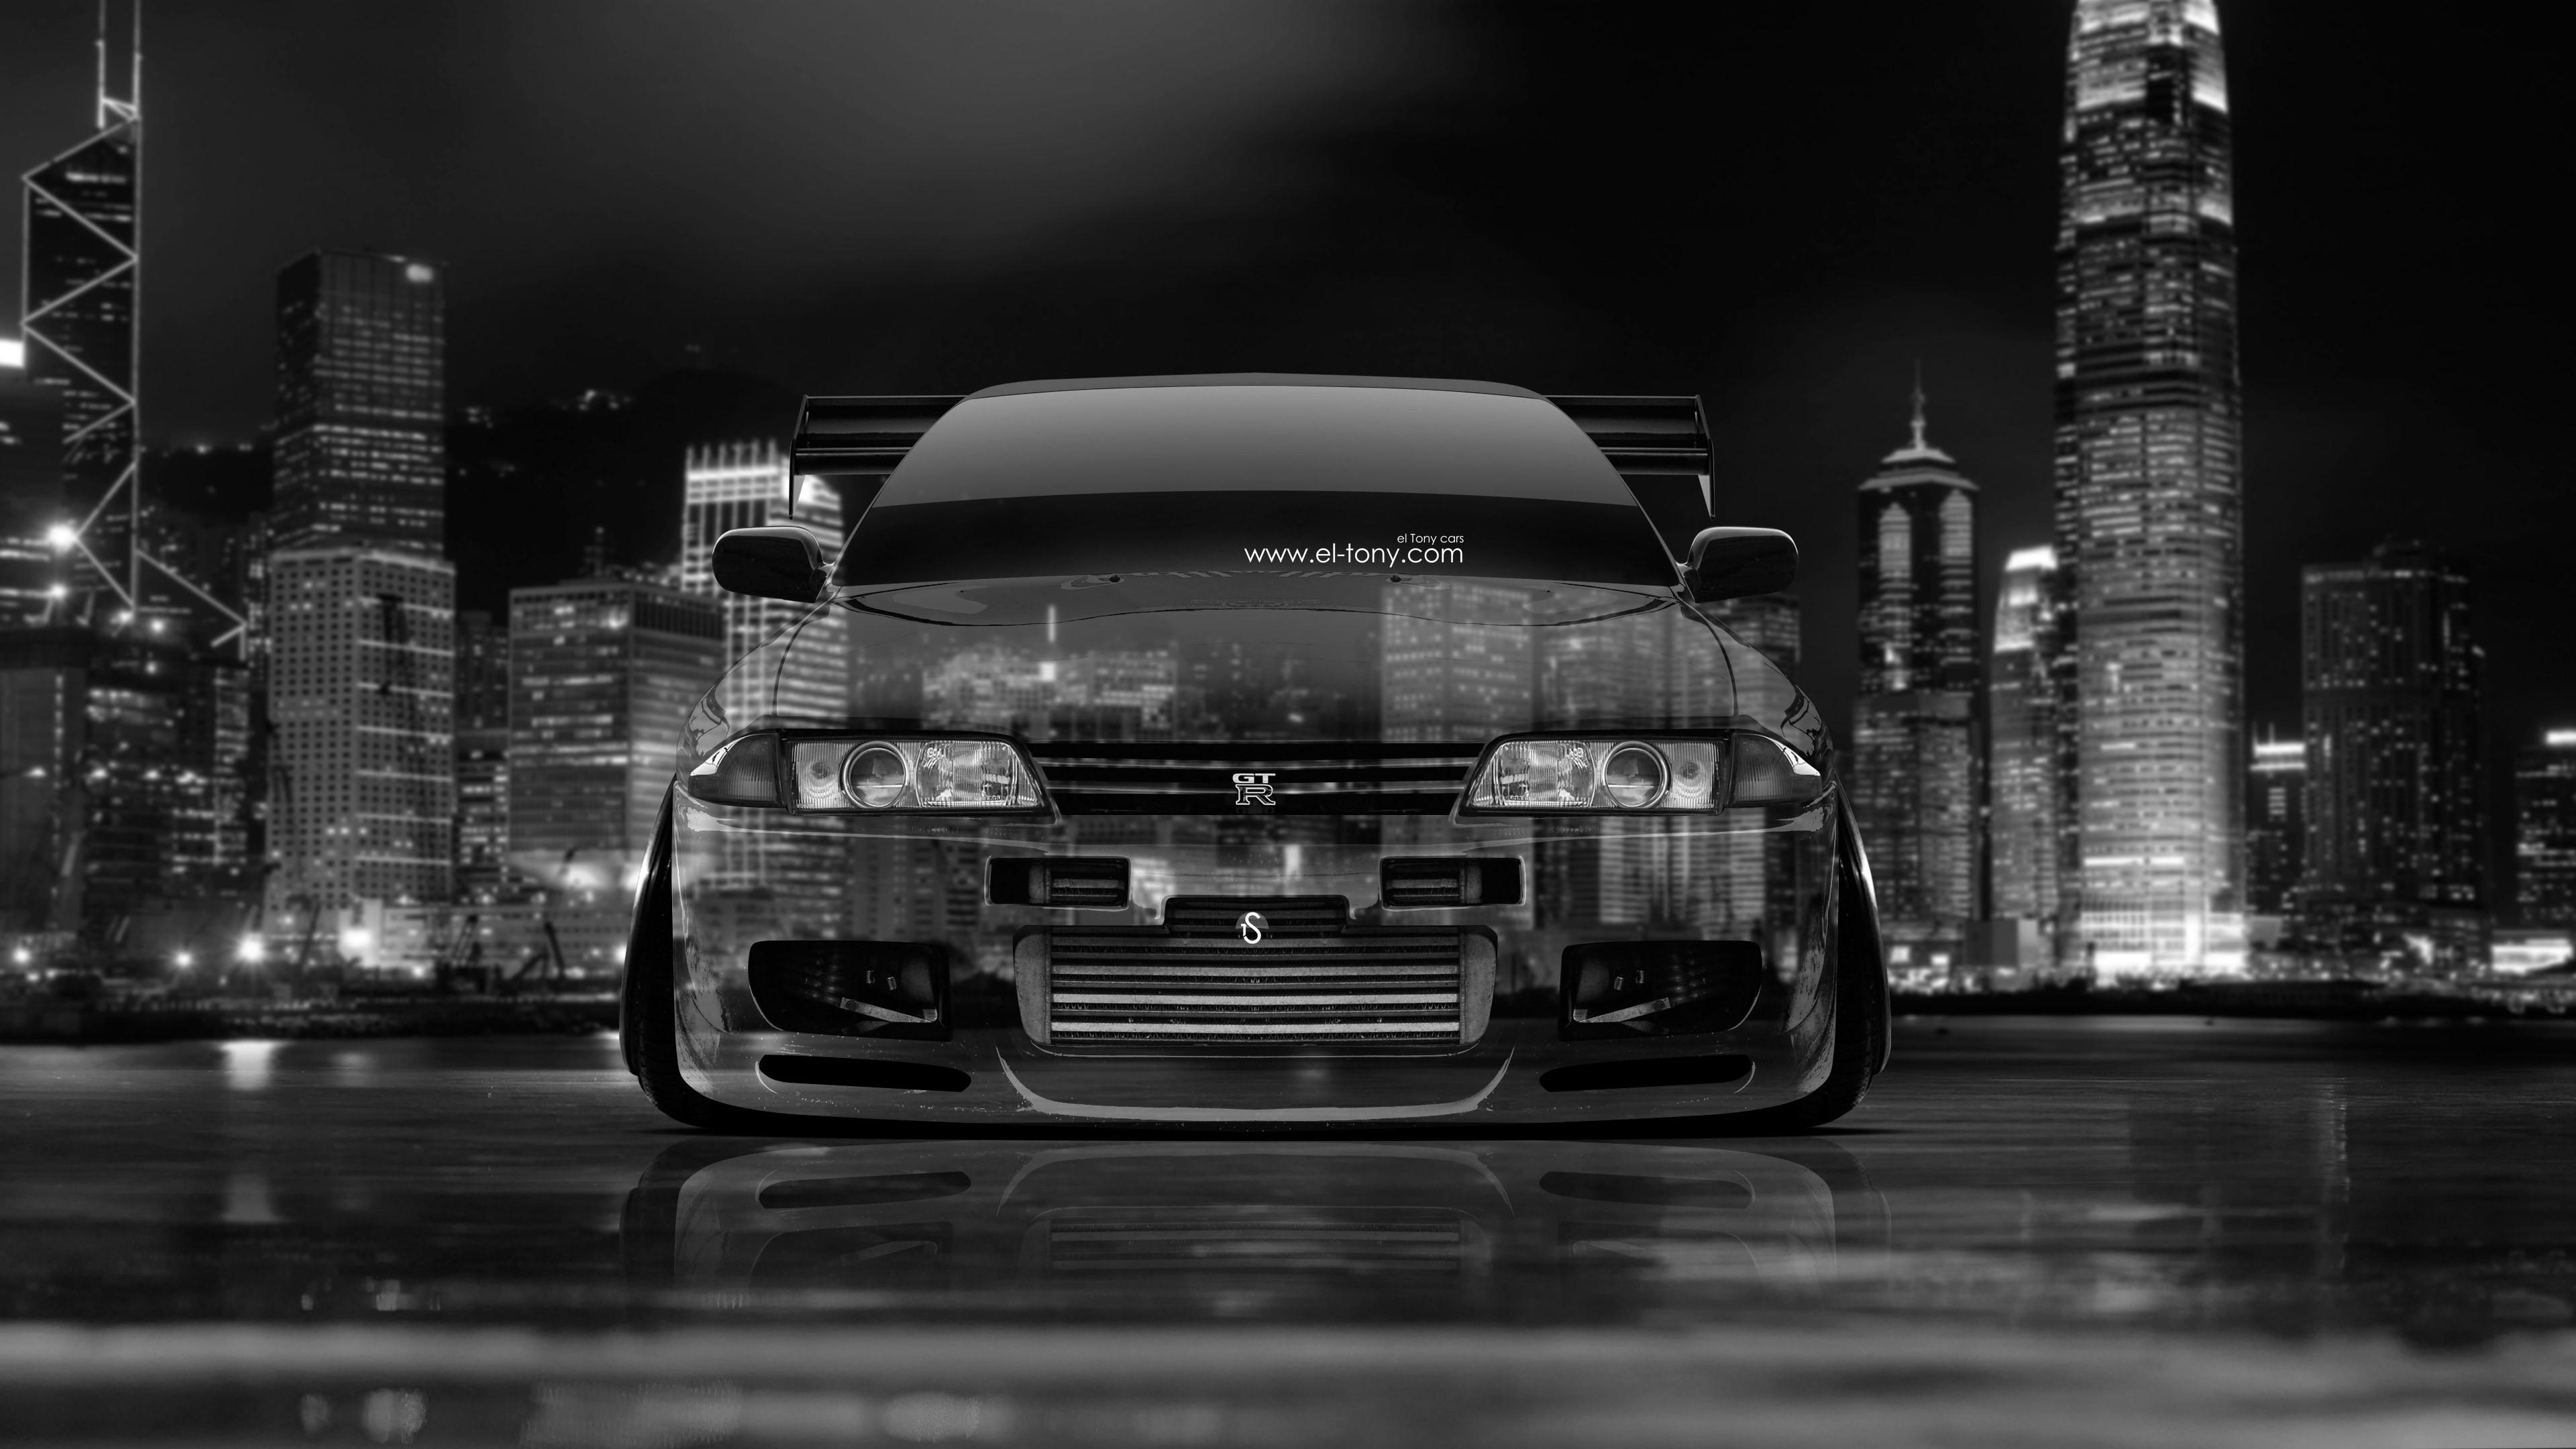 2560x1600 Nissan Skyline Wallpapers   Full HD Wallpaper Search